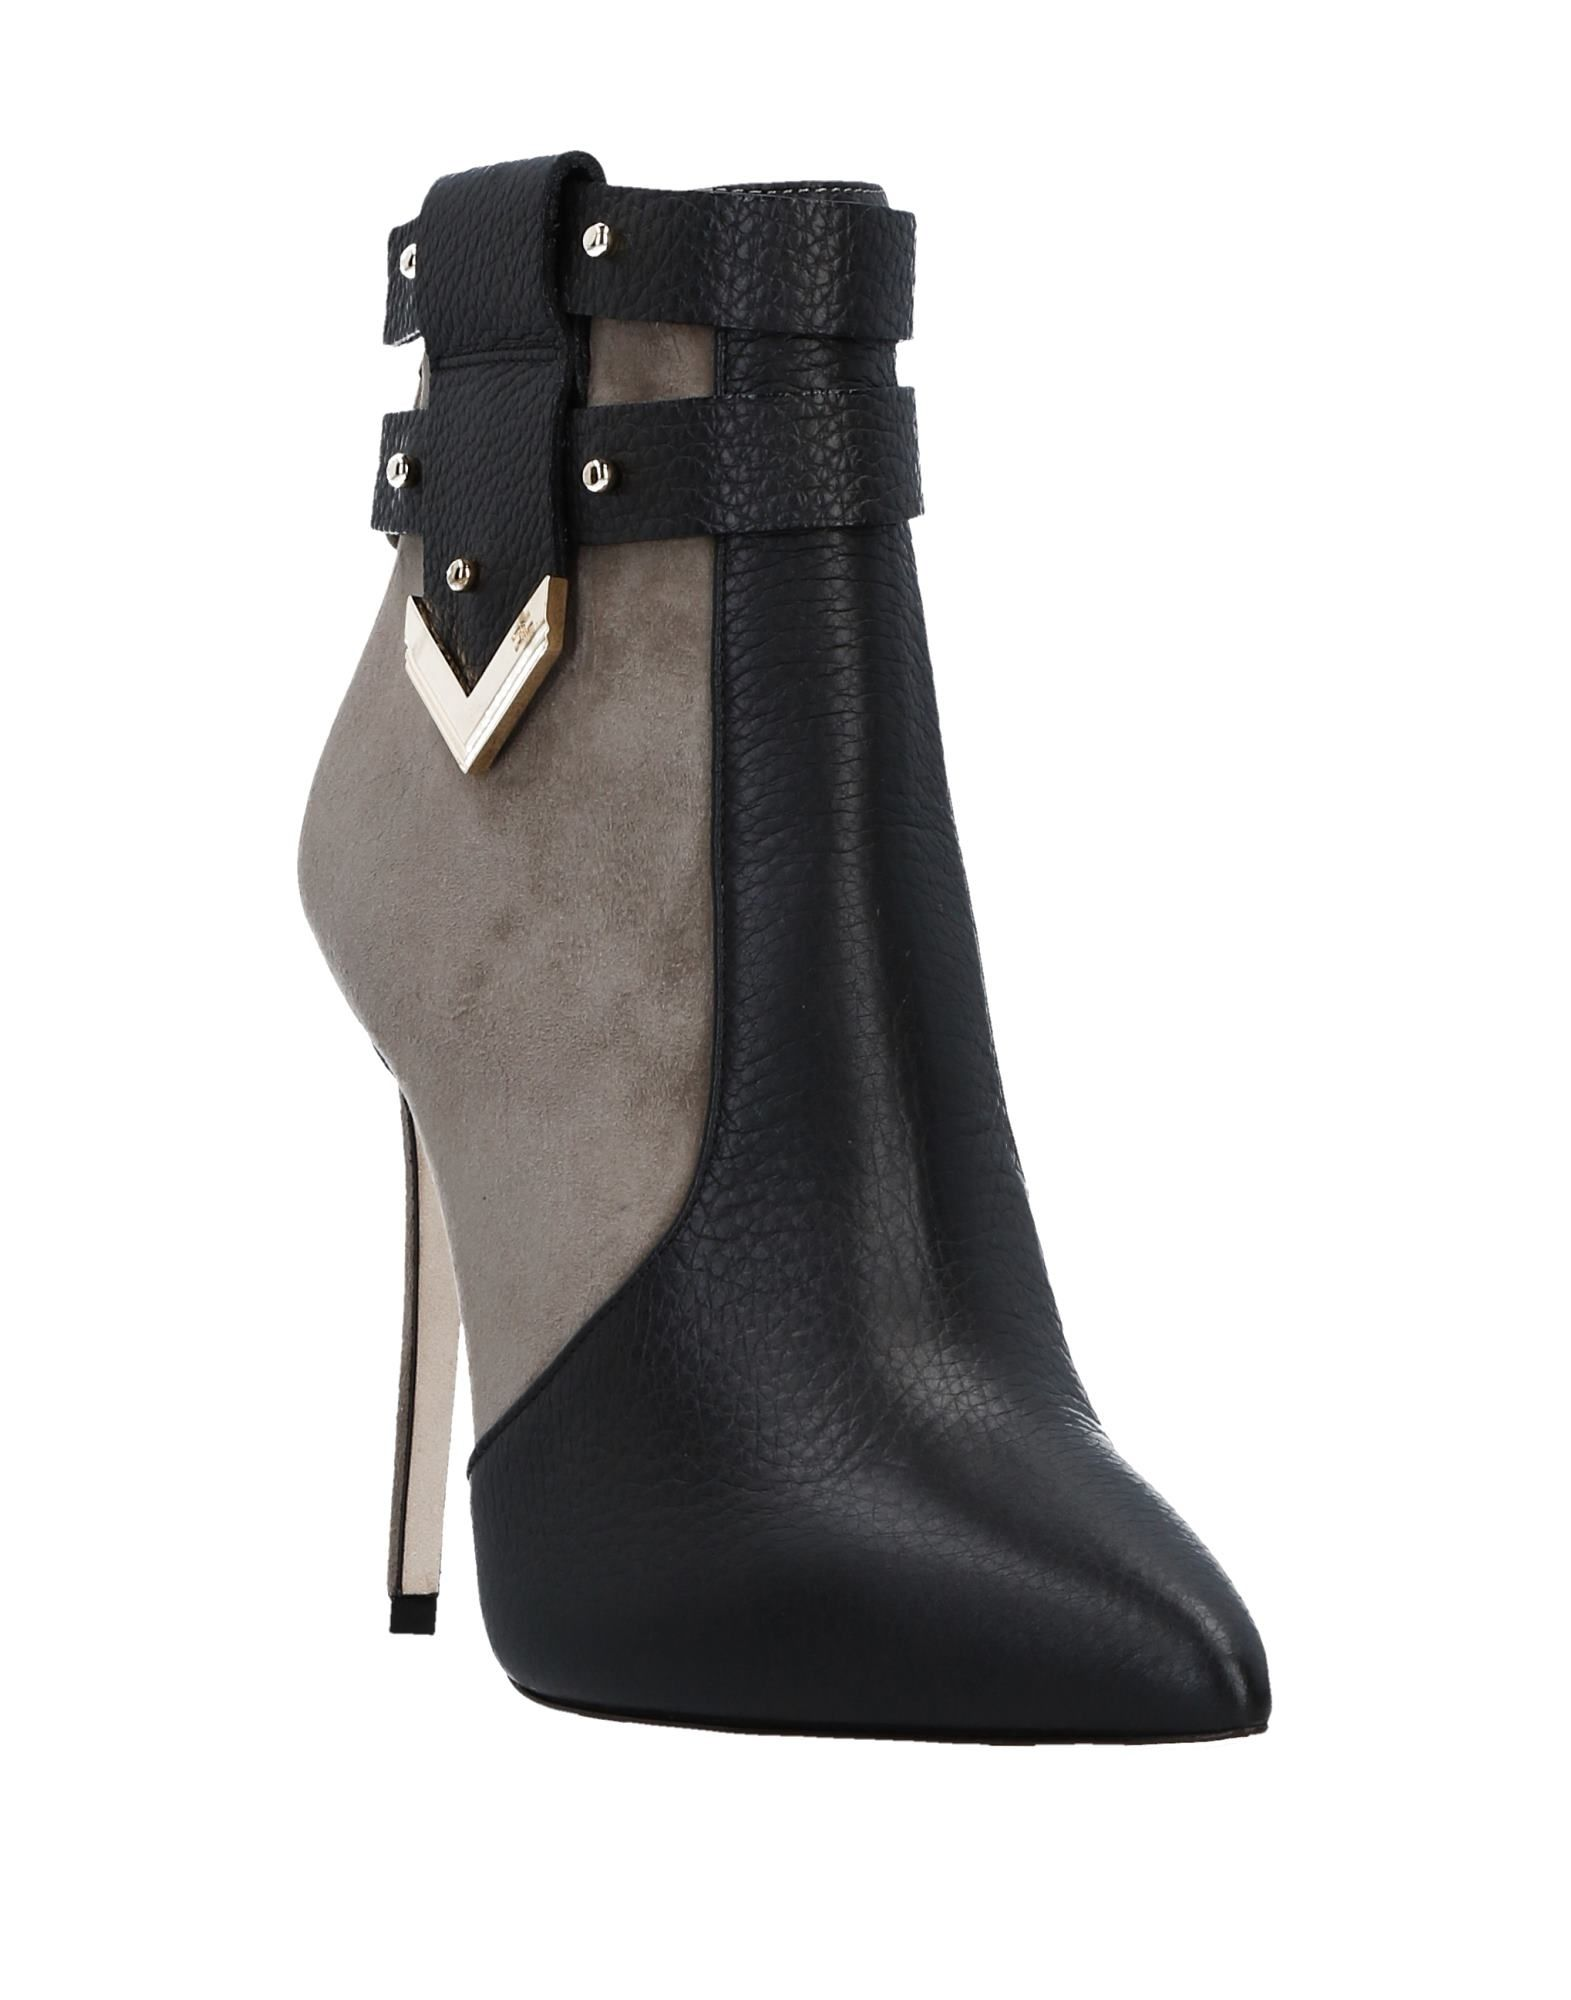 Elisabetta Franchi Stiefelette Damen Schuhe  11247943MGGünstige gut aussehende Schuhe Damen 475e8d